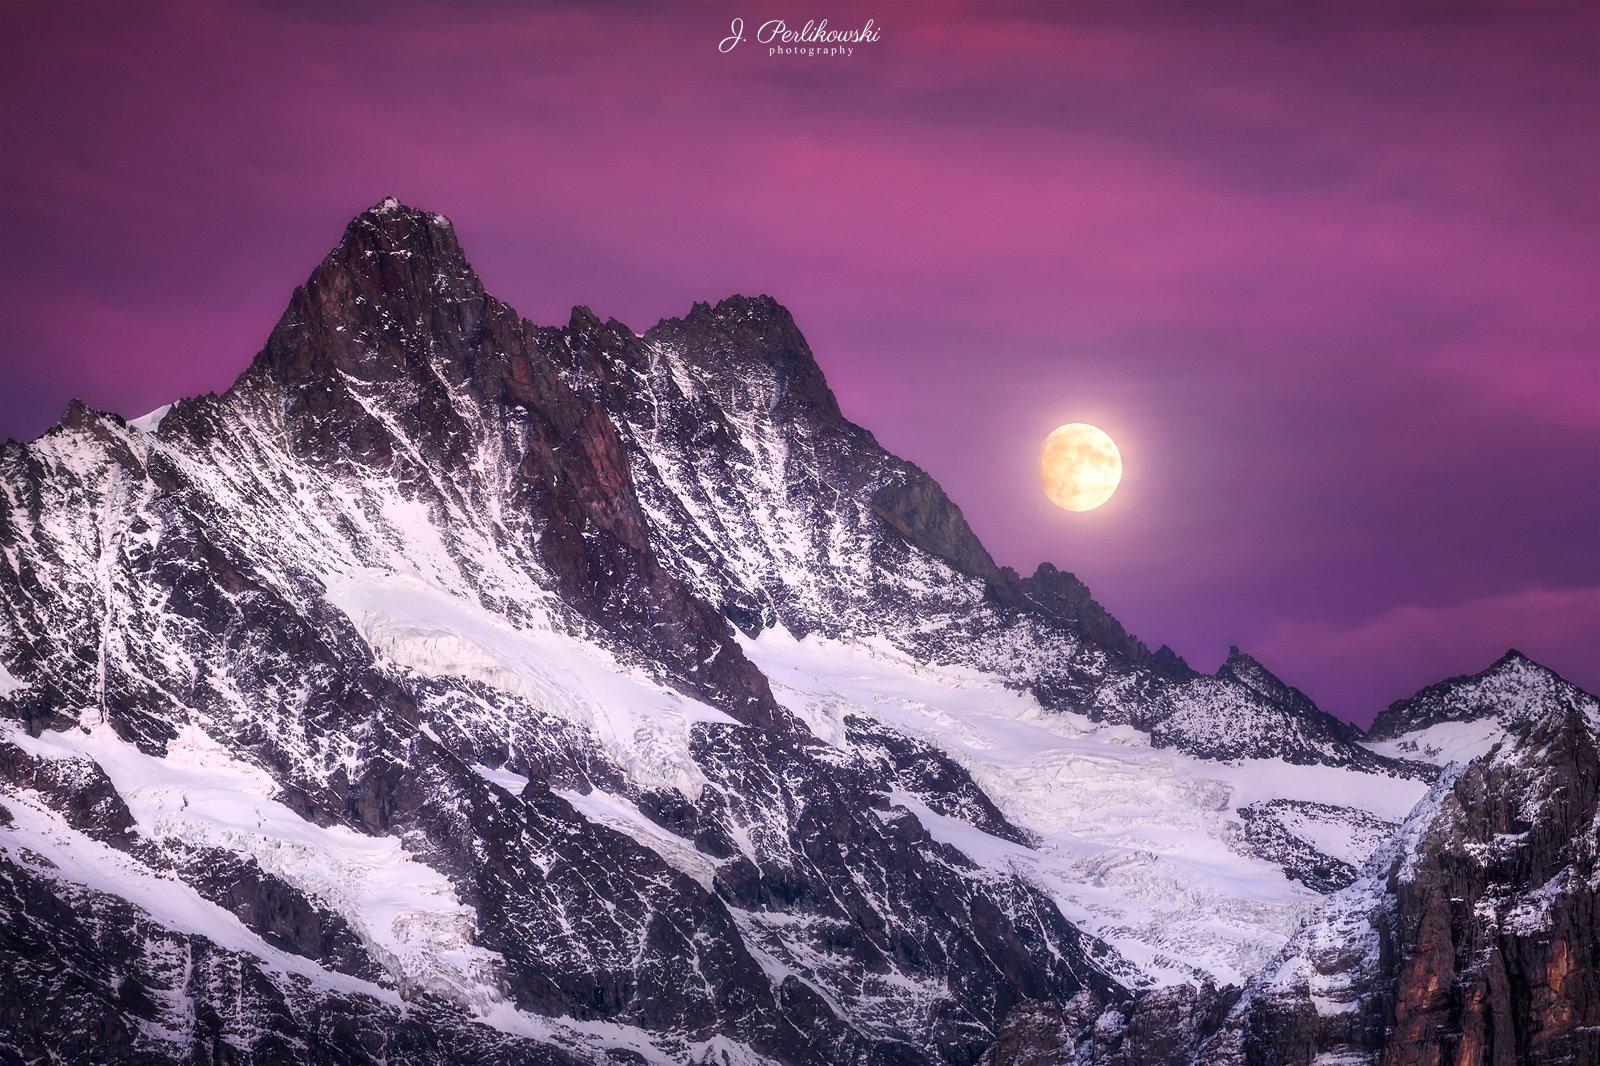 landscape,swiss, switzerland, moon, moon rise, colours, mountains,mountain,, Perlikowski Jakub